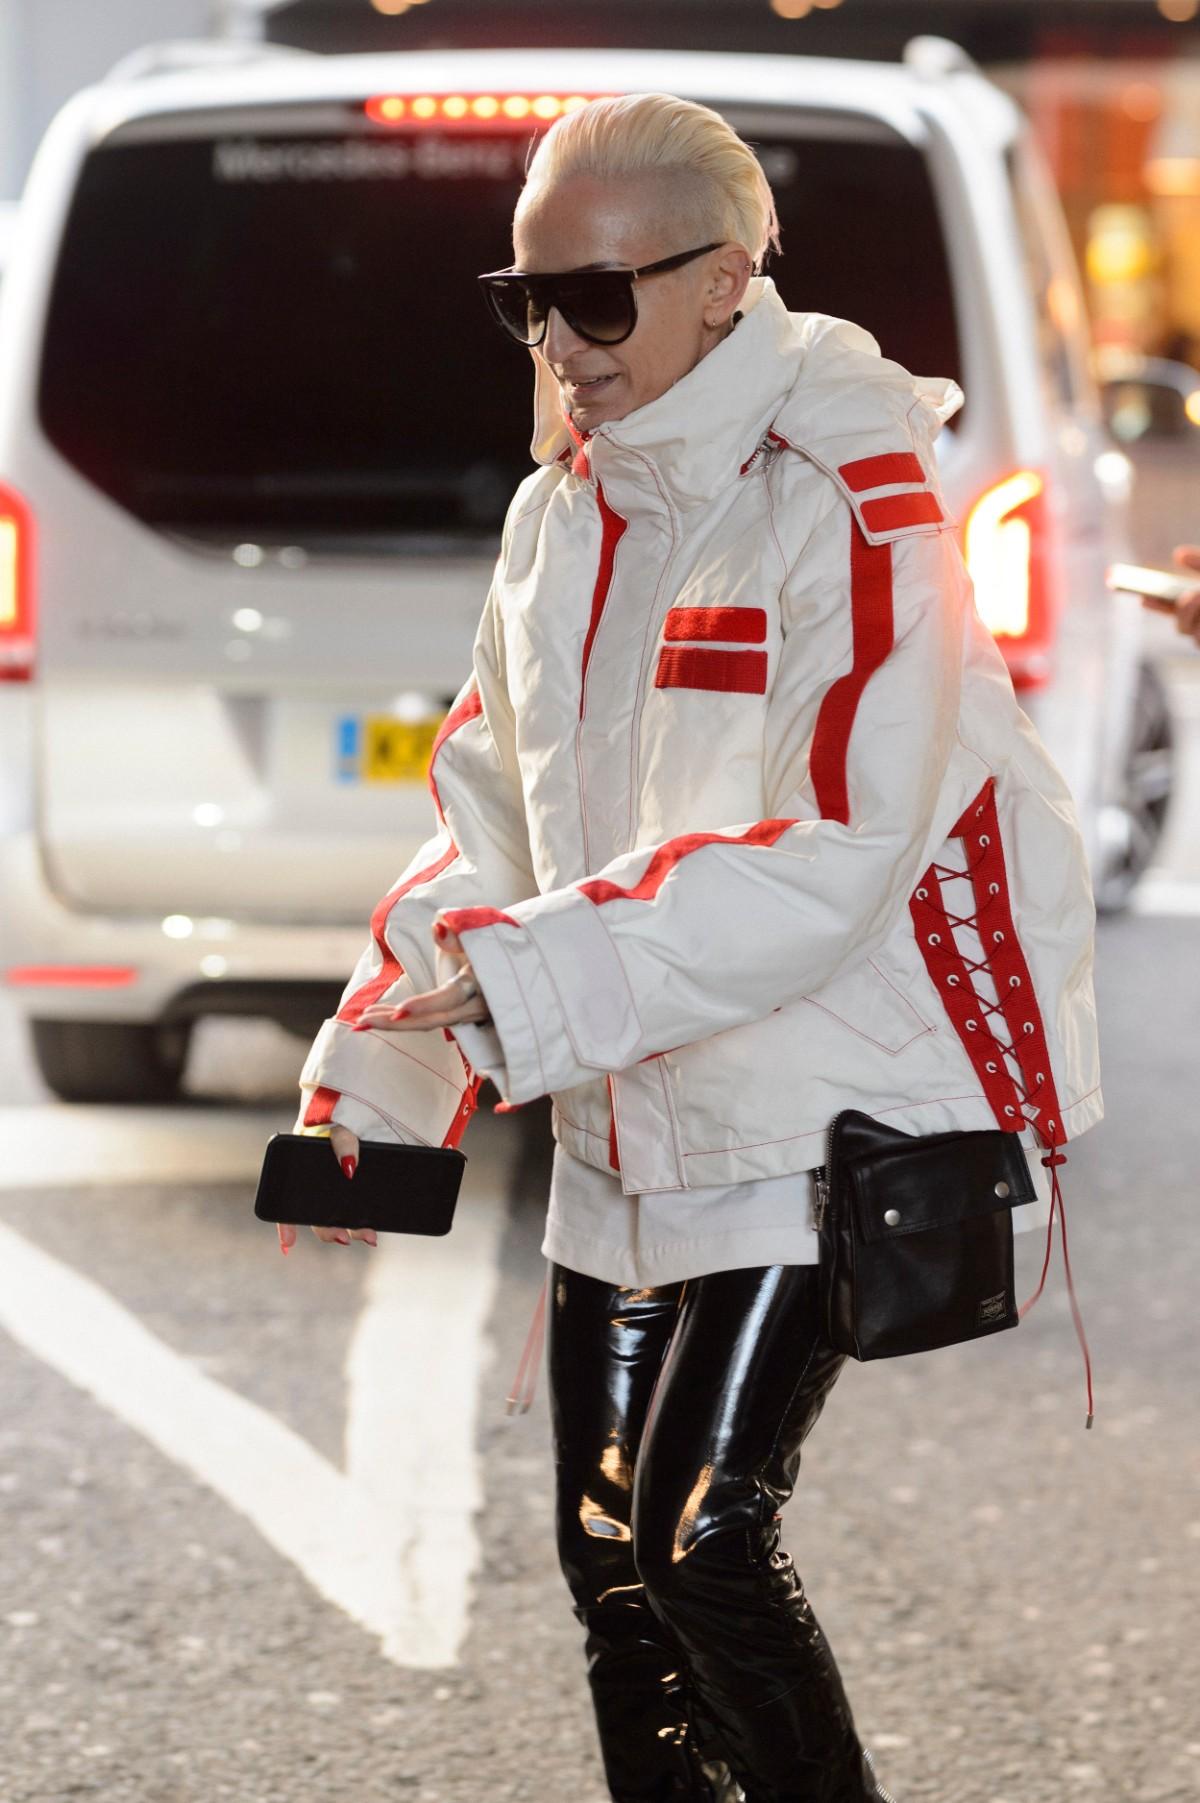 London Street Fall Men's Fashion Trends 2018 Brings